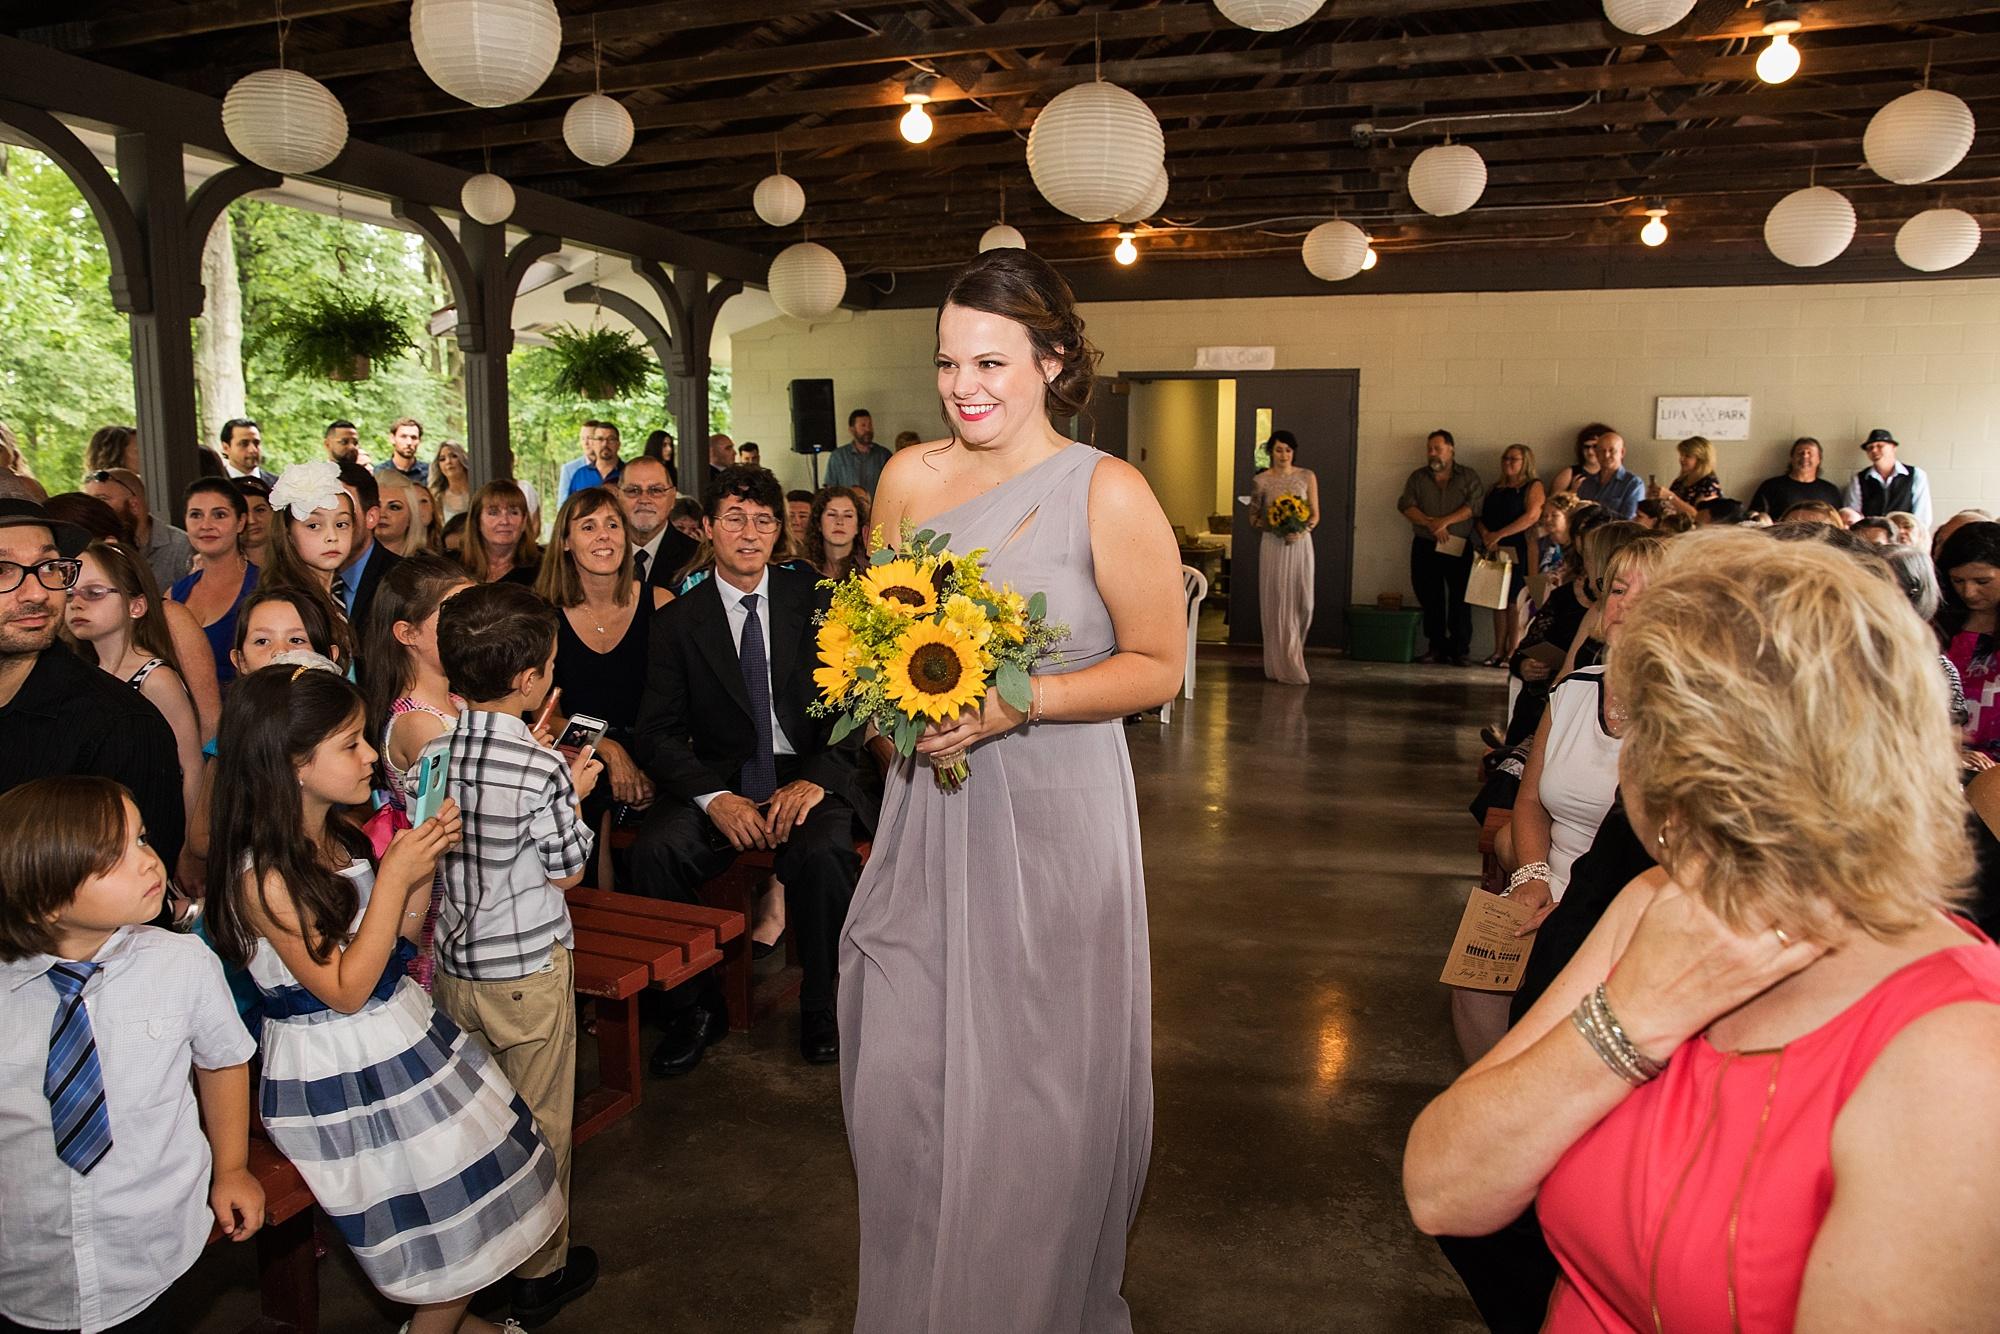 lipapark-hernderwinery-wedding_0058.jpg